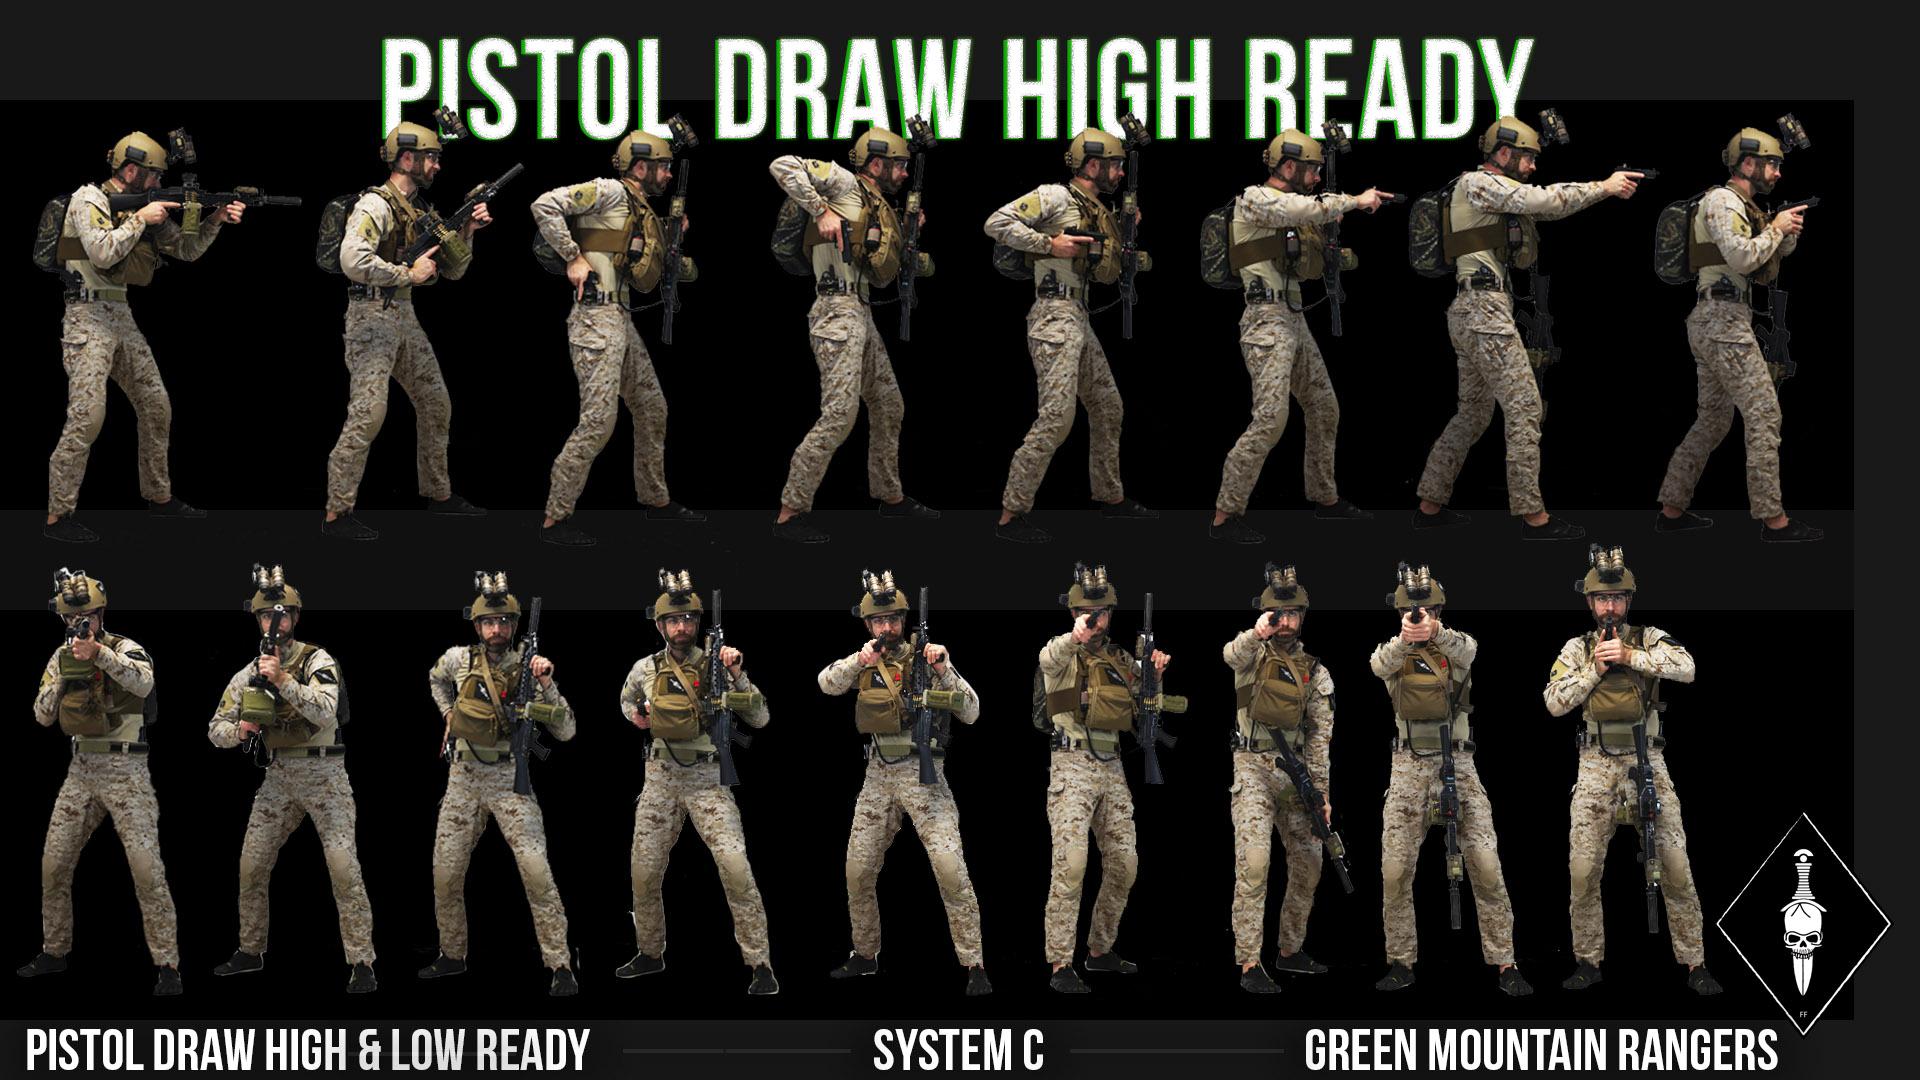 PistolDrawHighReady4.jpg